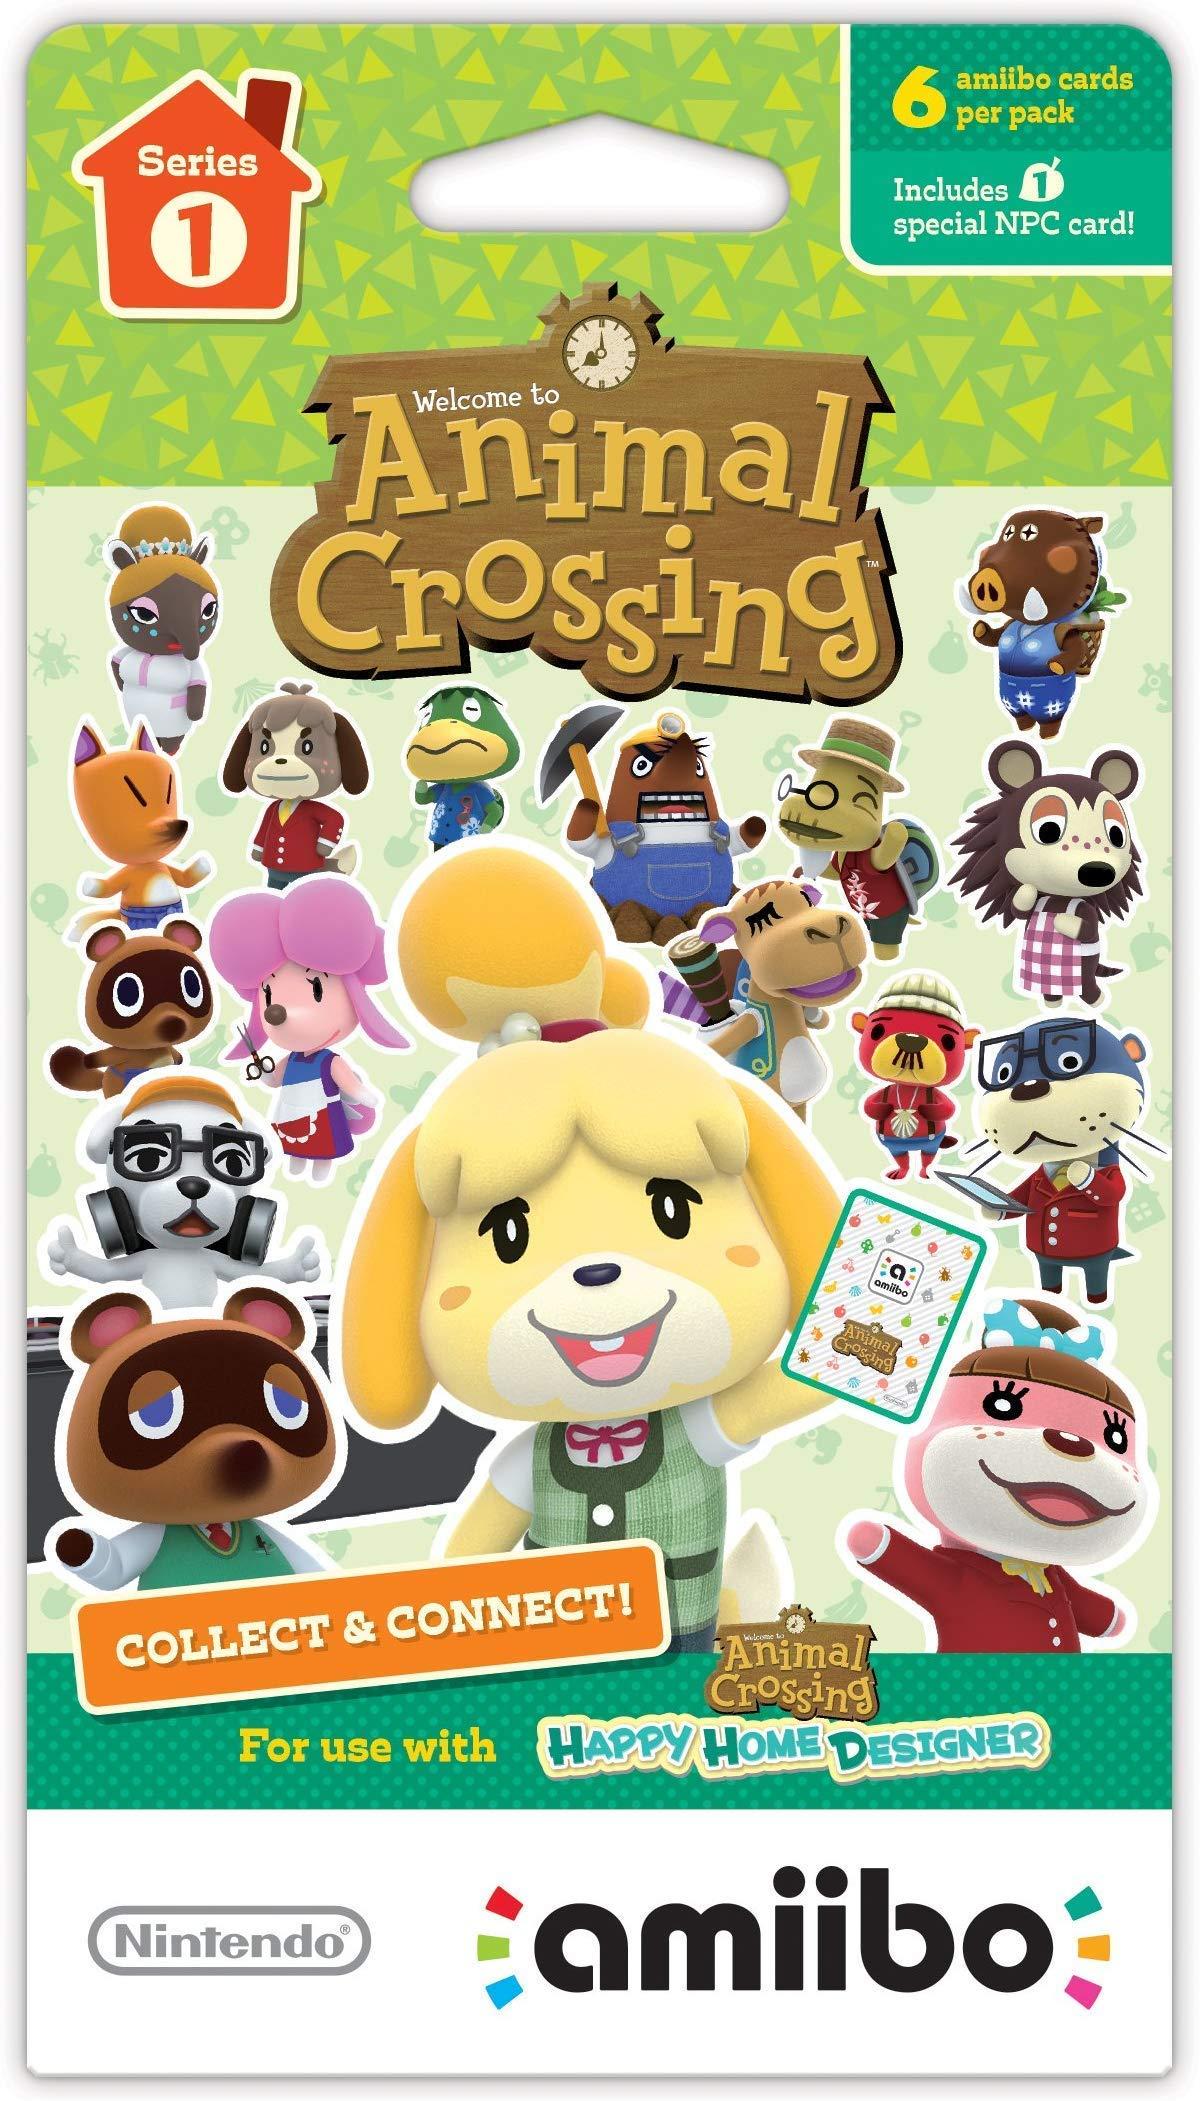 Animal Crossing Amiibo Cards Series 1 - Full box (18 Packs) (6 Cards Per Pack/108 Cards) (Renewed)